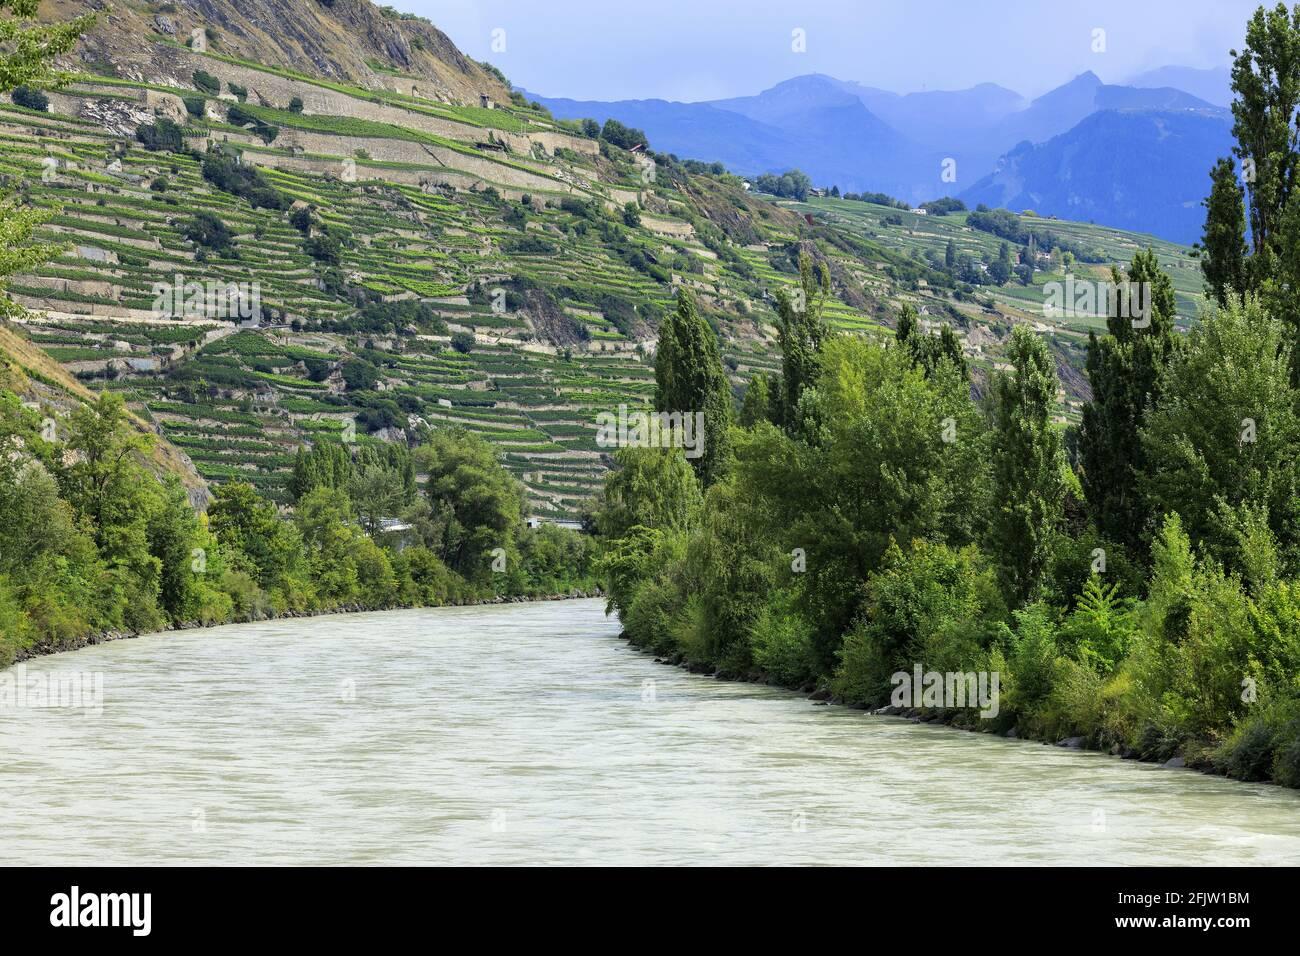 Schweiz, Kanton Wallis, Sion, Fluss Le Rhone, Walliser Weinberge Stockfoto